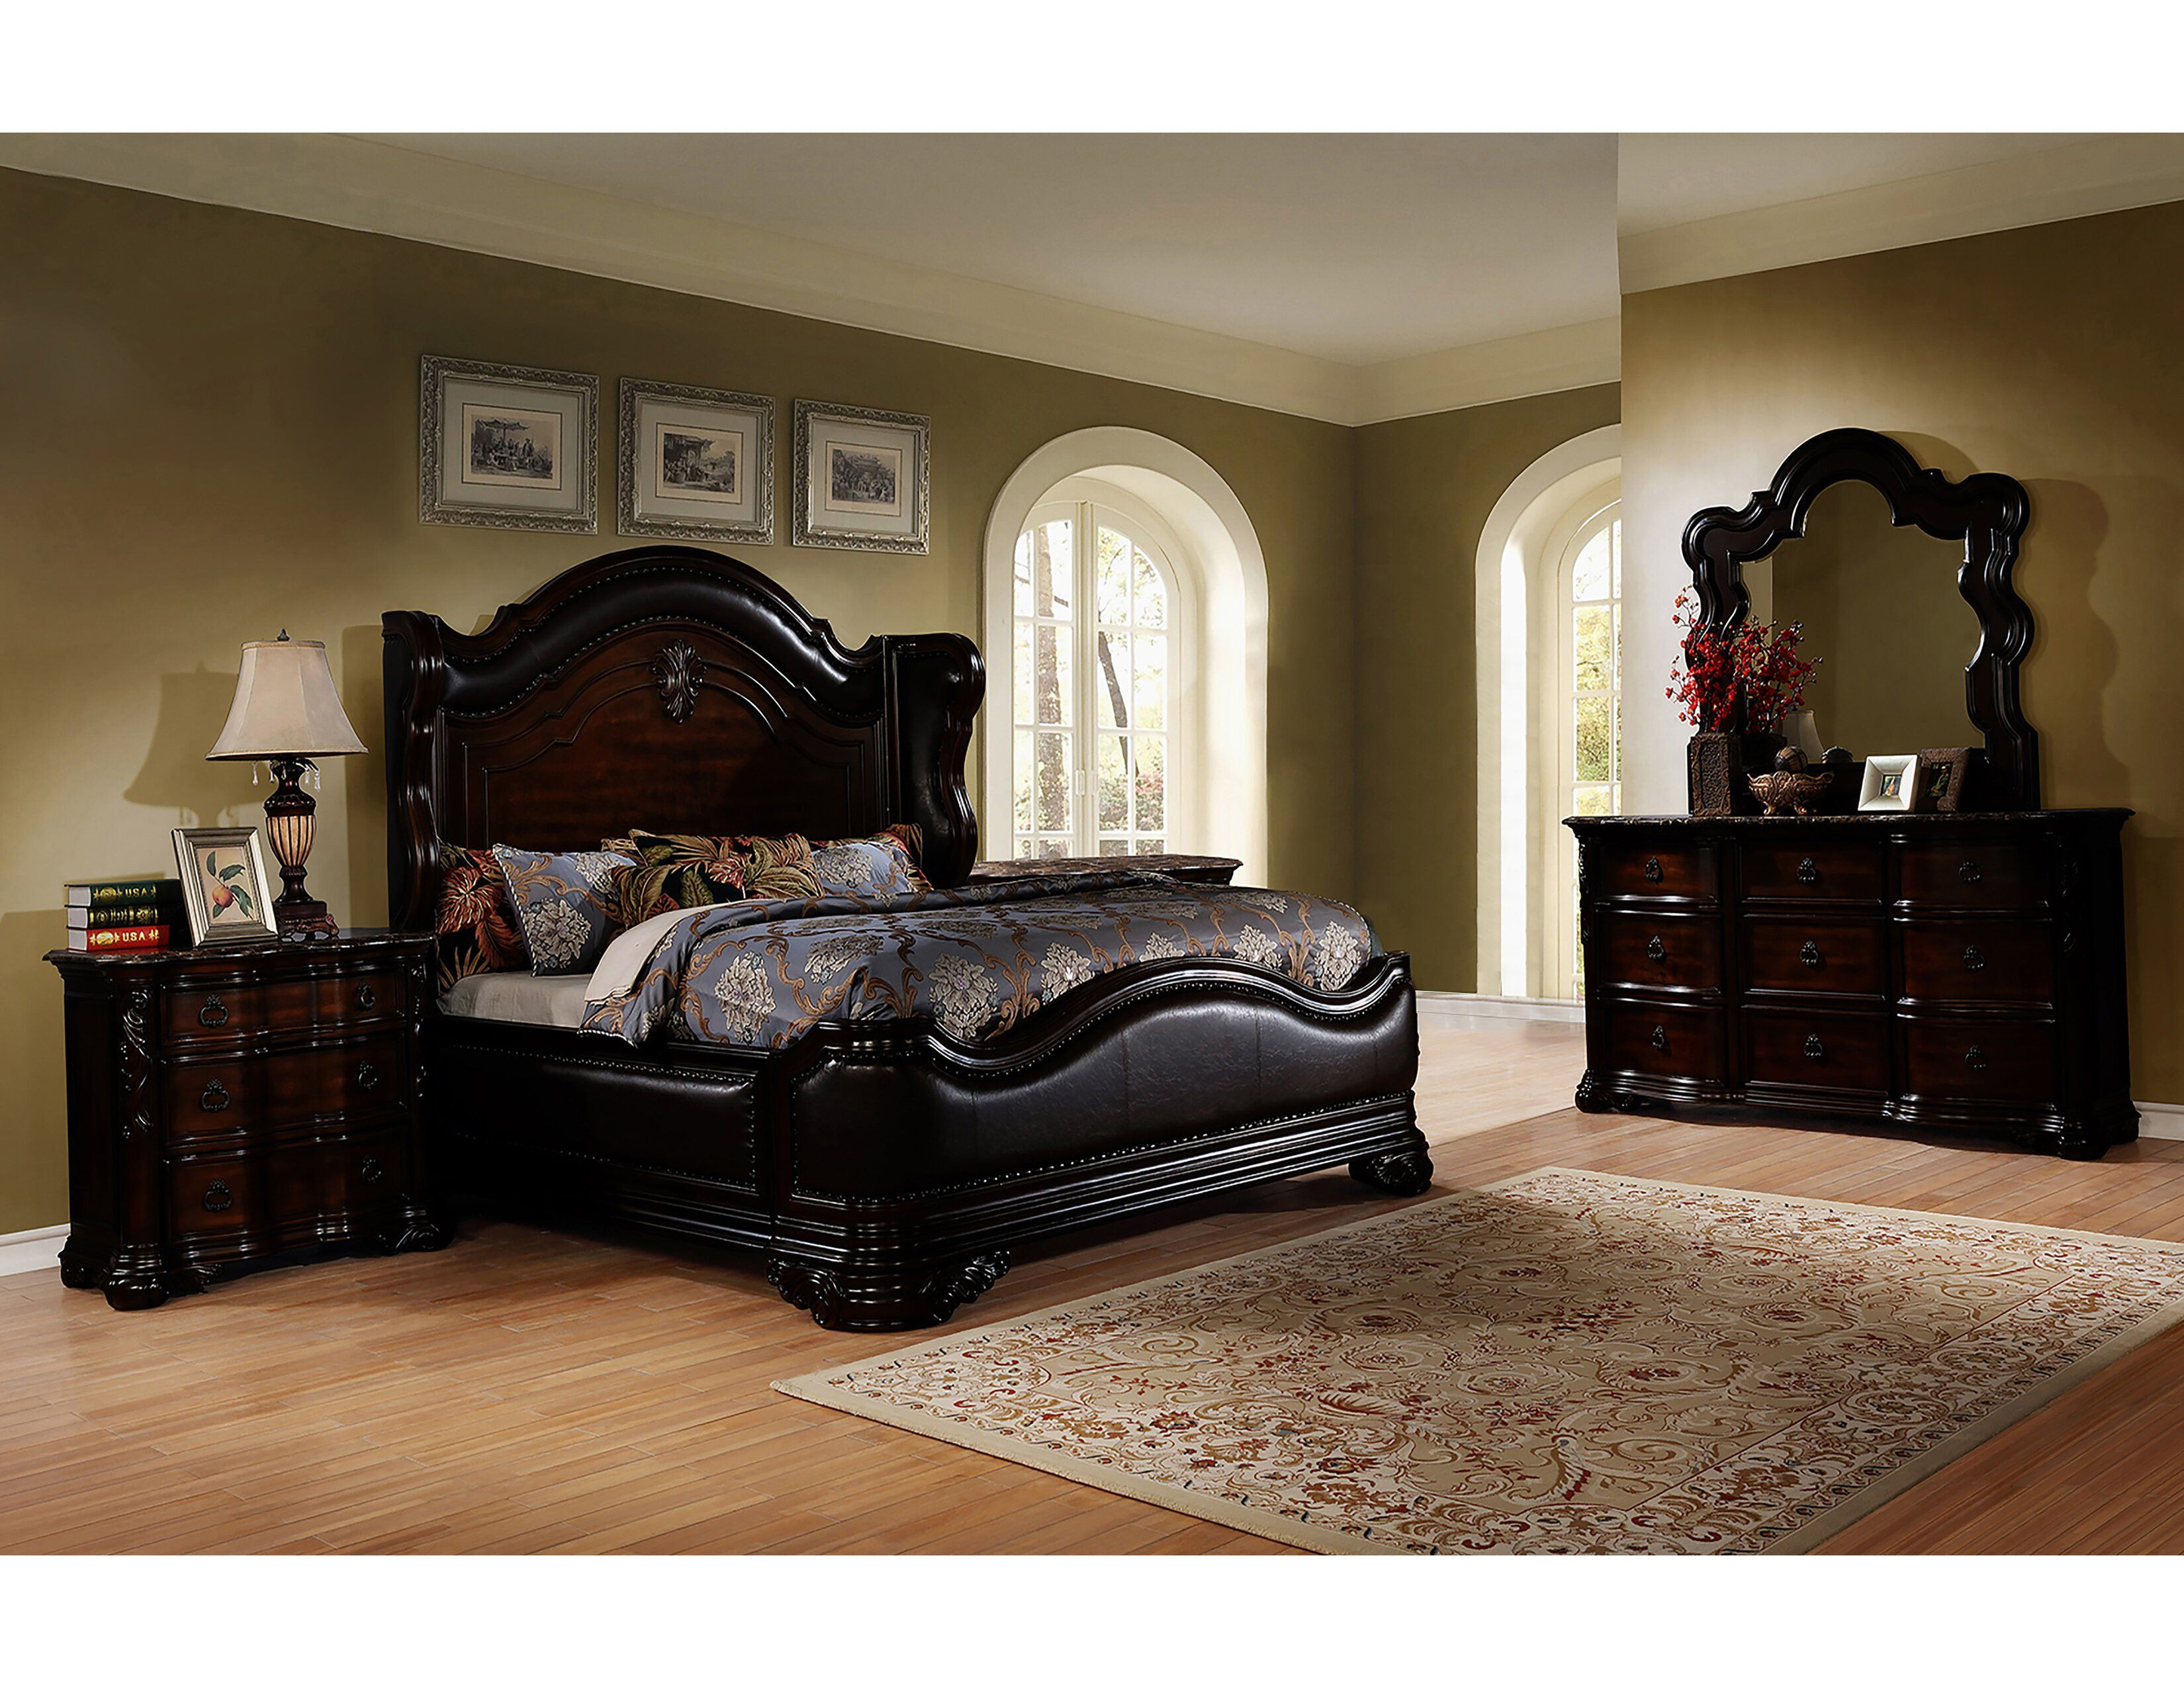 Mellina 5 Piece Cal King Bedroom Set Full Bedroom Furniture Sets King Bedroom Sets Rustic Bedroom Design